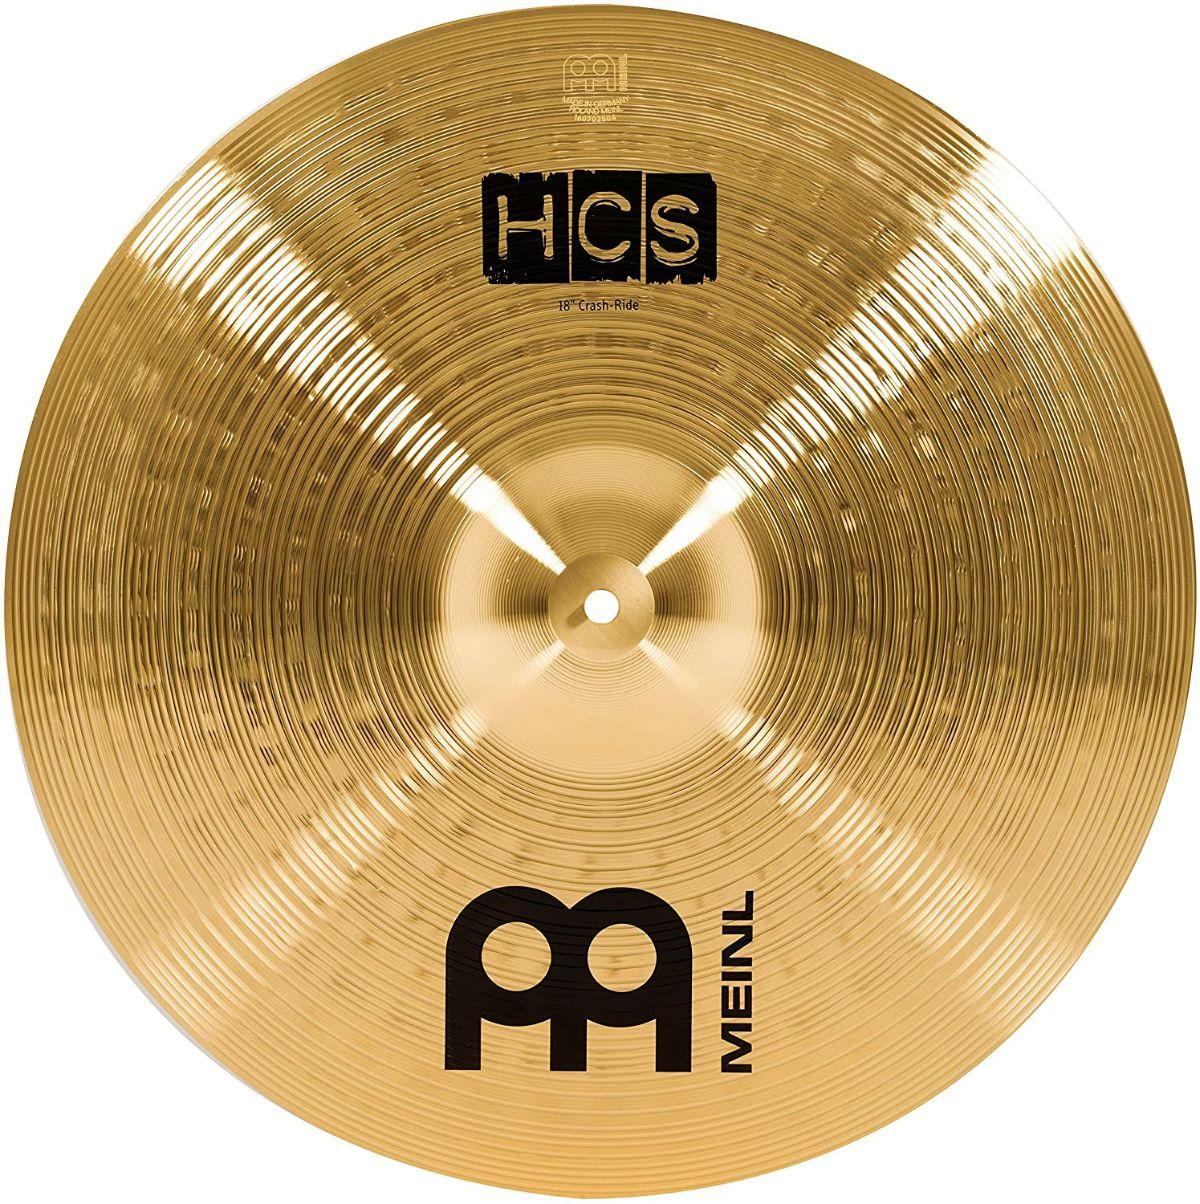 "Meinl HCS 18"" Crash Ride Cymbal"